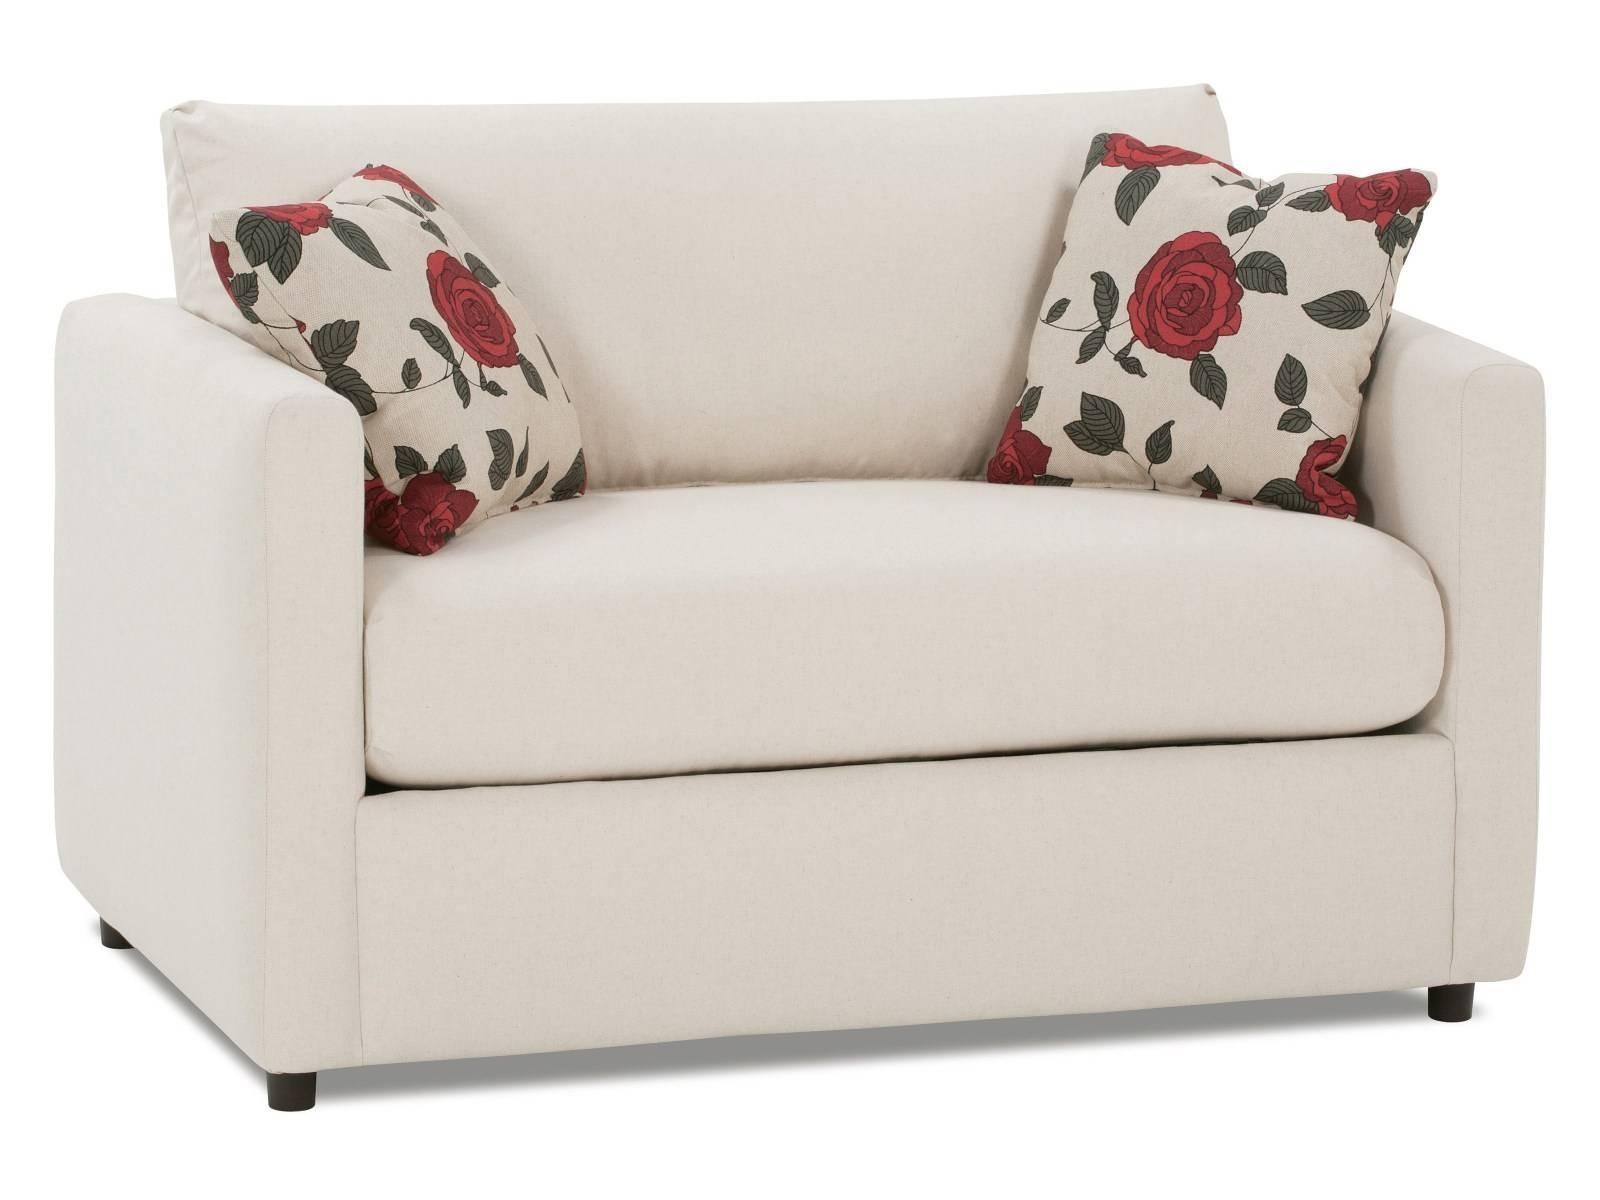 Sofa : Corner Sofas Inspirational Corner Sofas On Credit' Delight Throughout 2X2 Corner Sofas (Image 13 of 21)